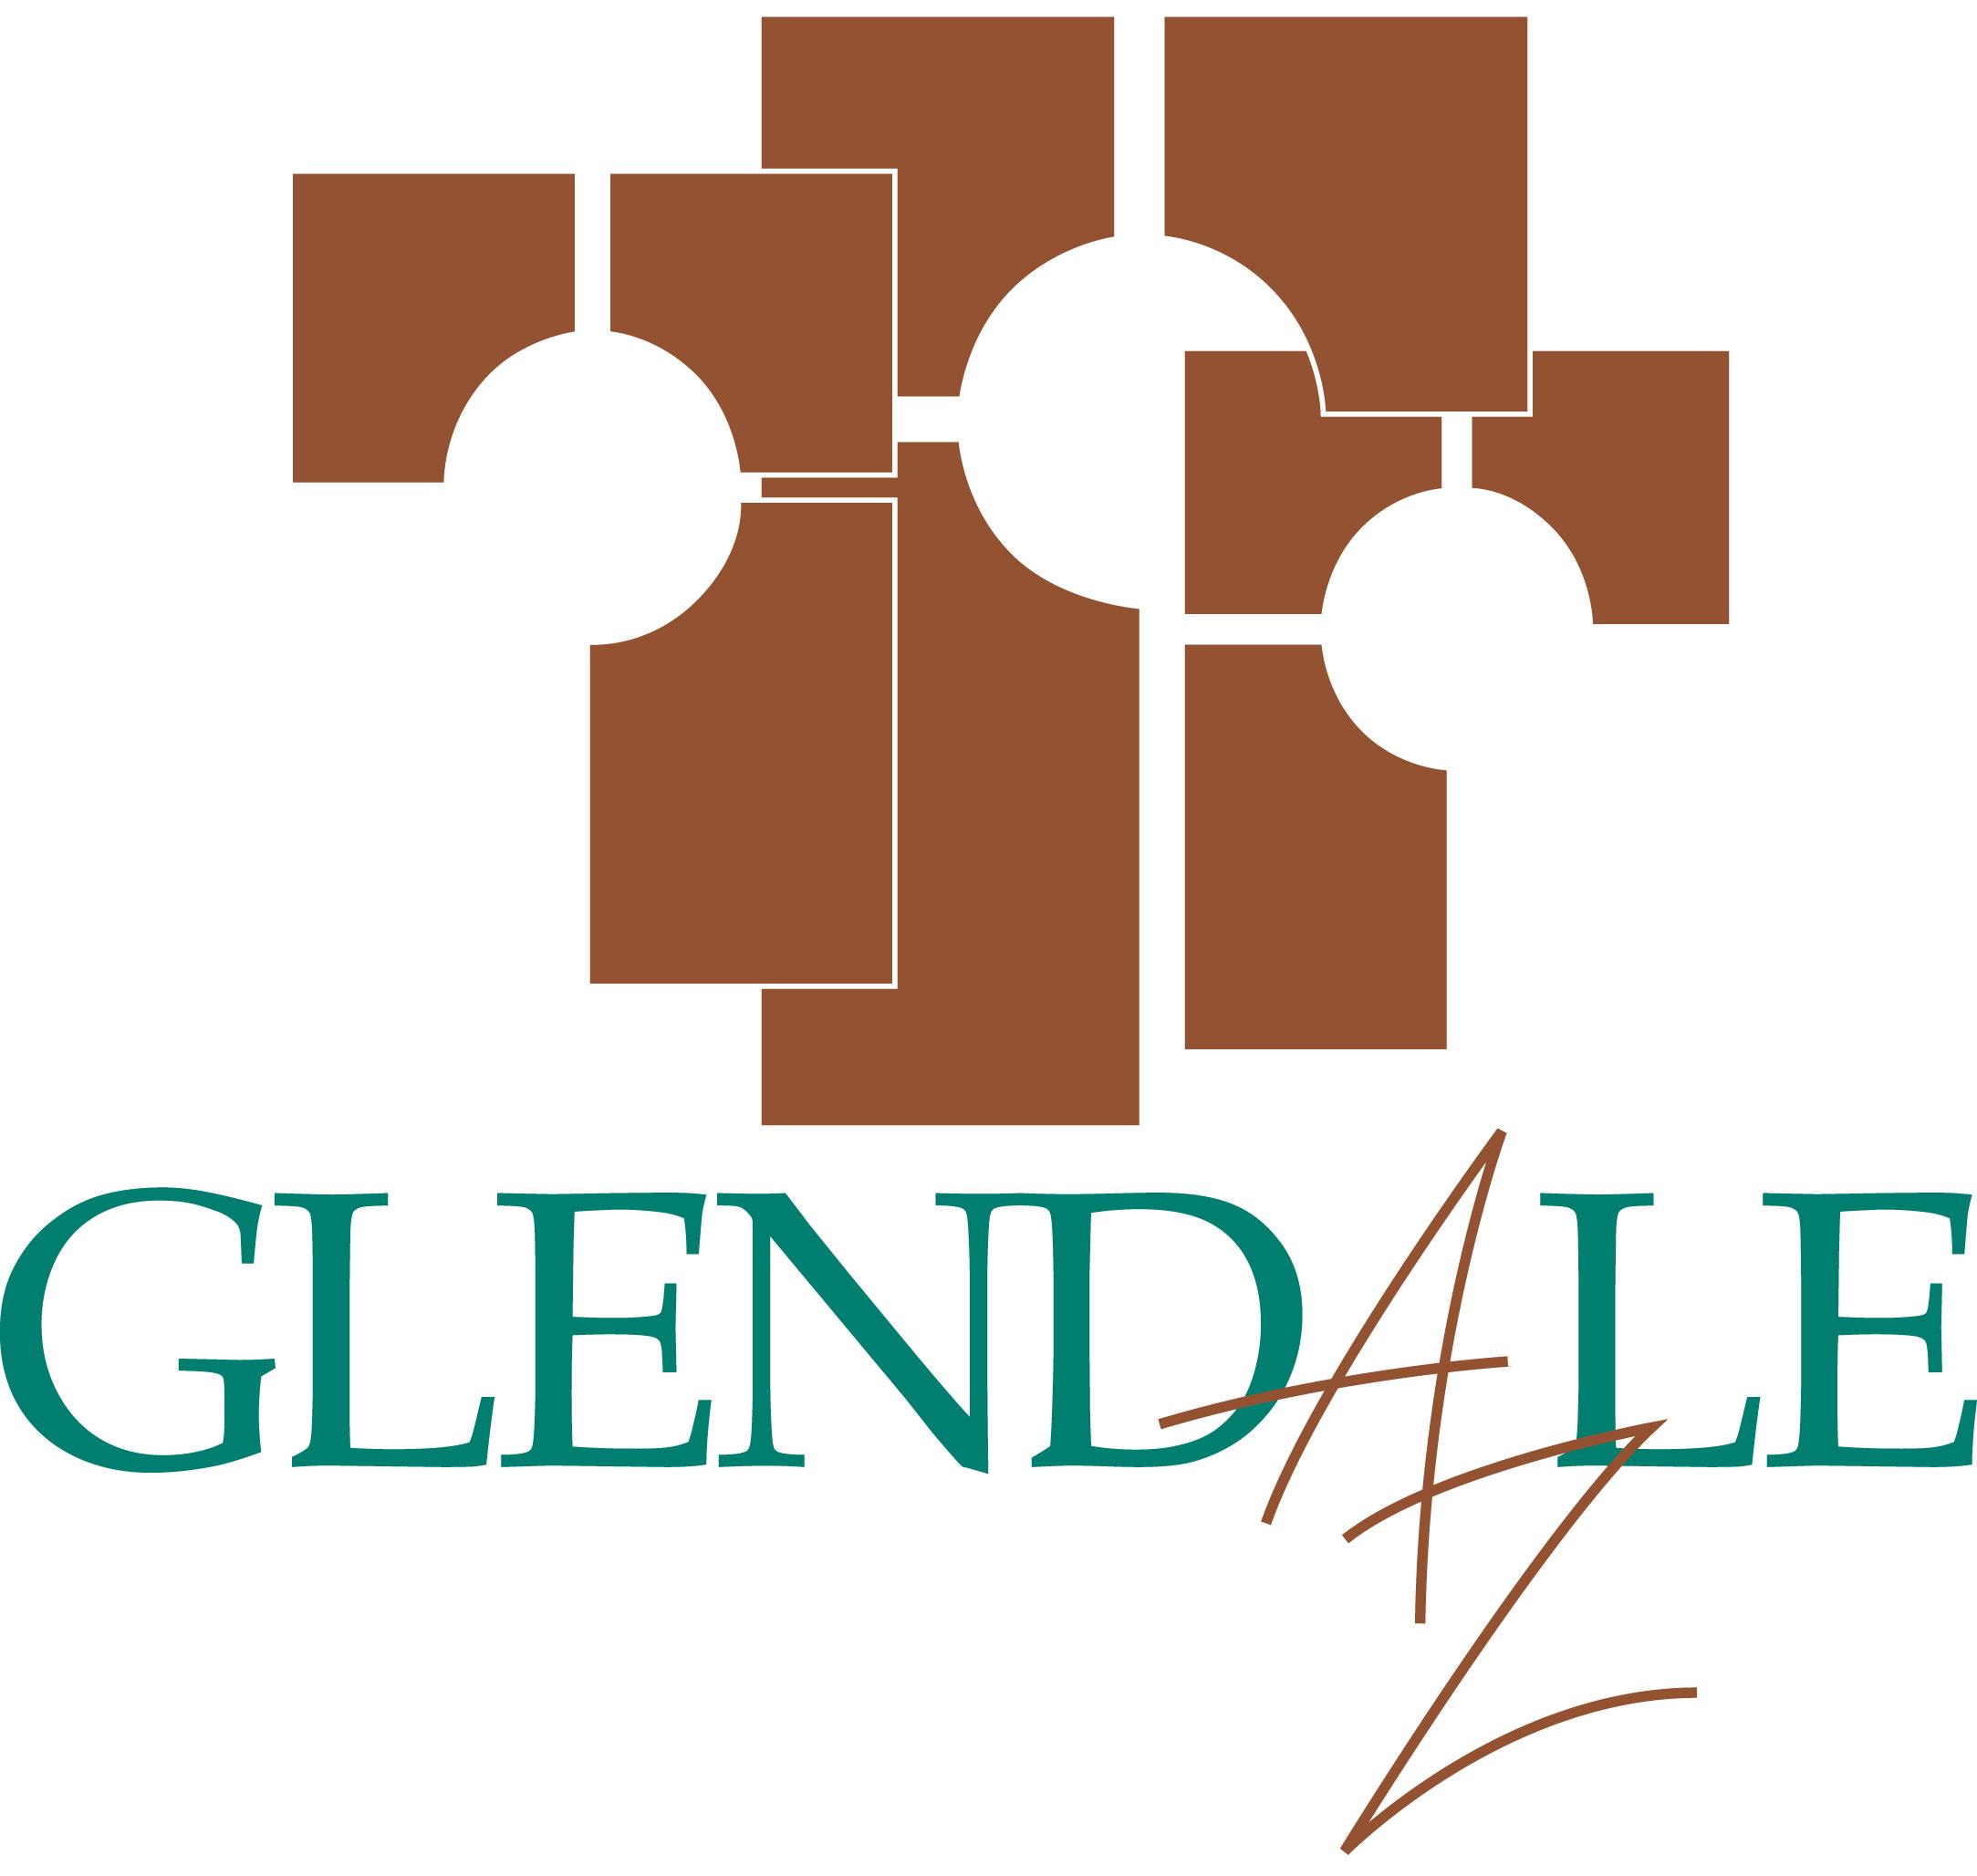 Glendale Arizona Seal